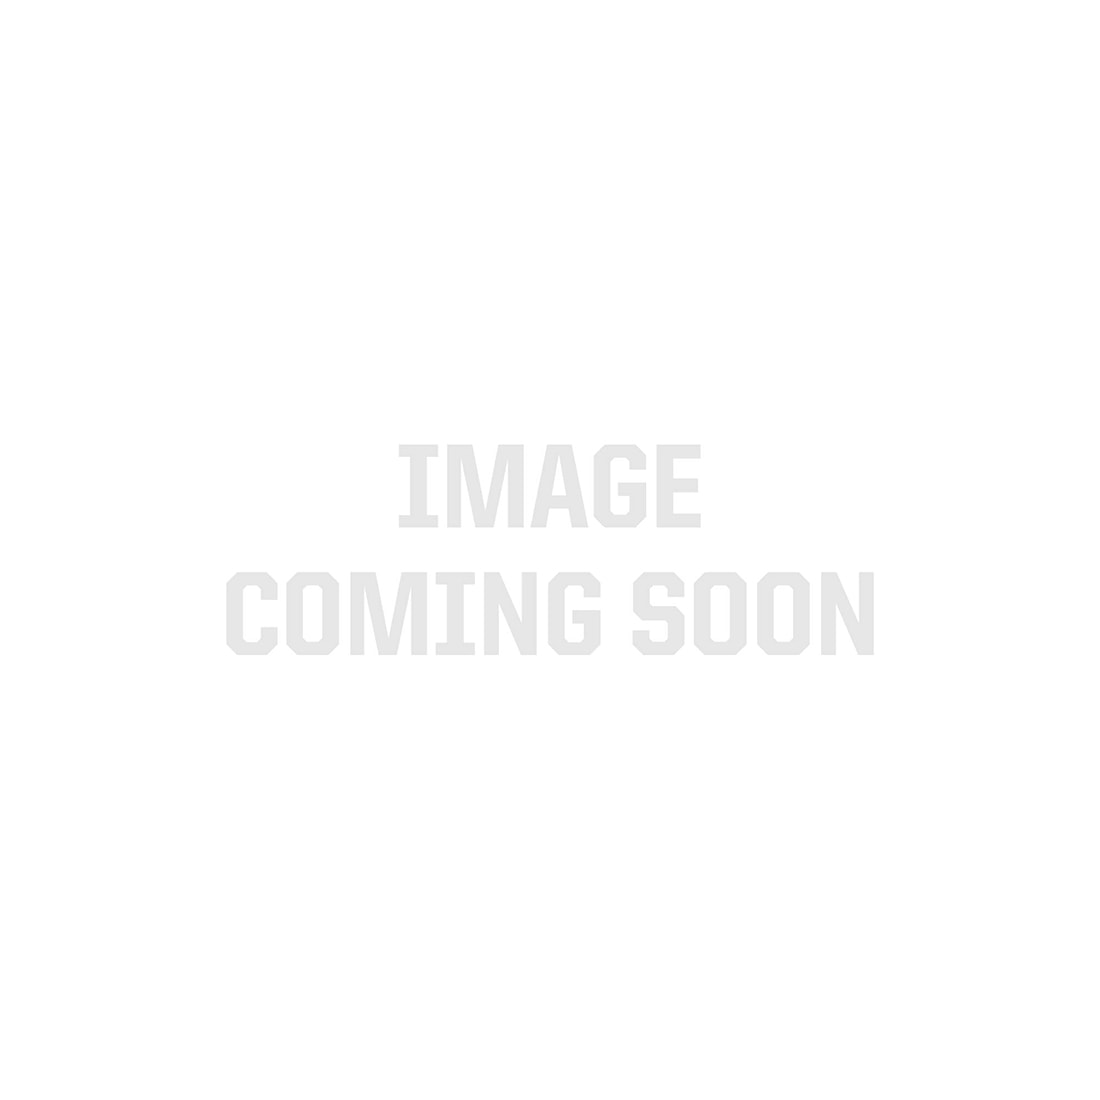 Waterproof Warm White 3528 Quad Row LED Strip Light, 450/m, 28mm wide, Sample Kit